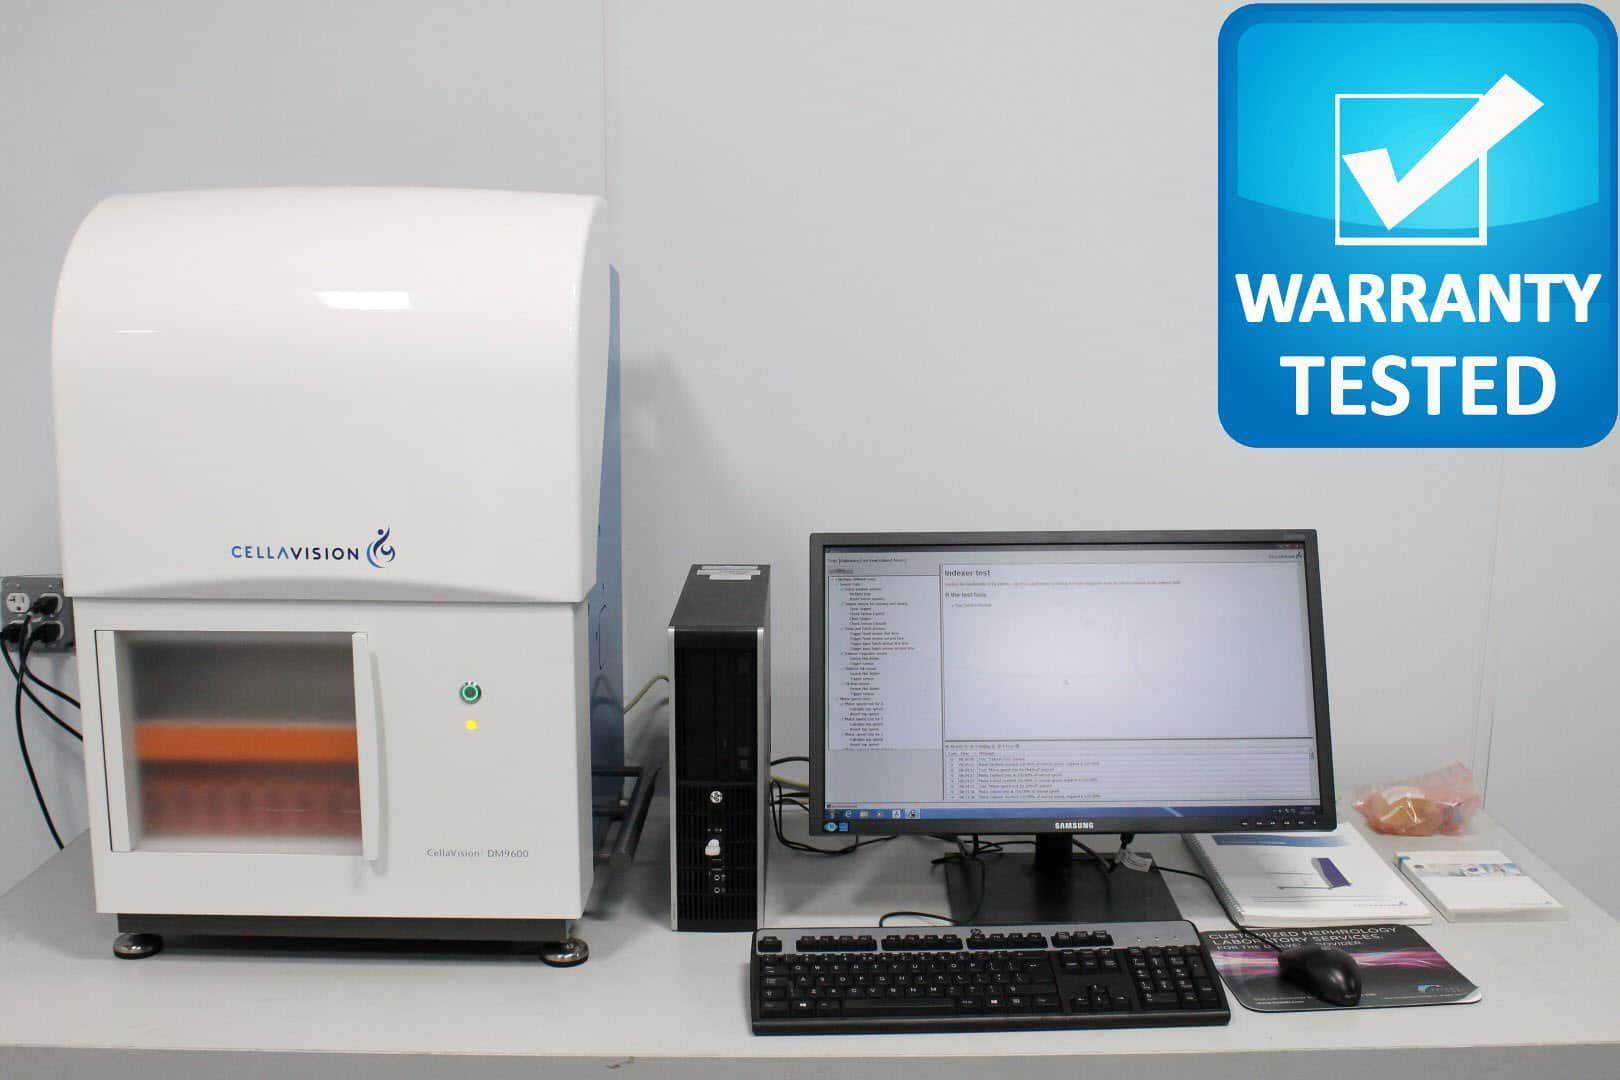 Sysmex CellaVision DM9600 Digital Cell Morphology Analyzer